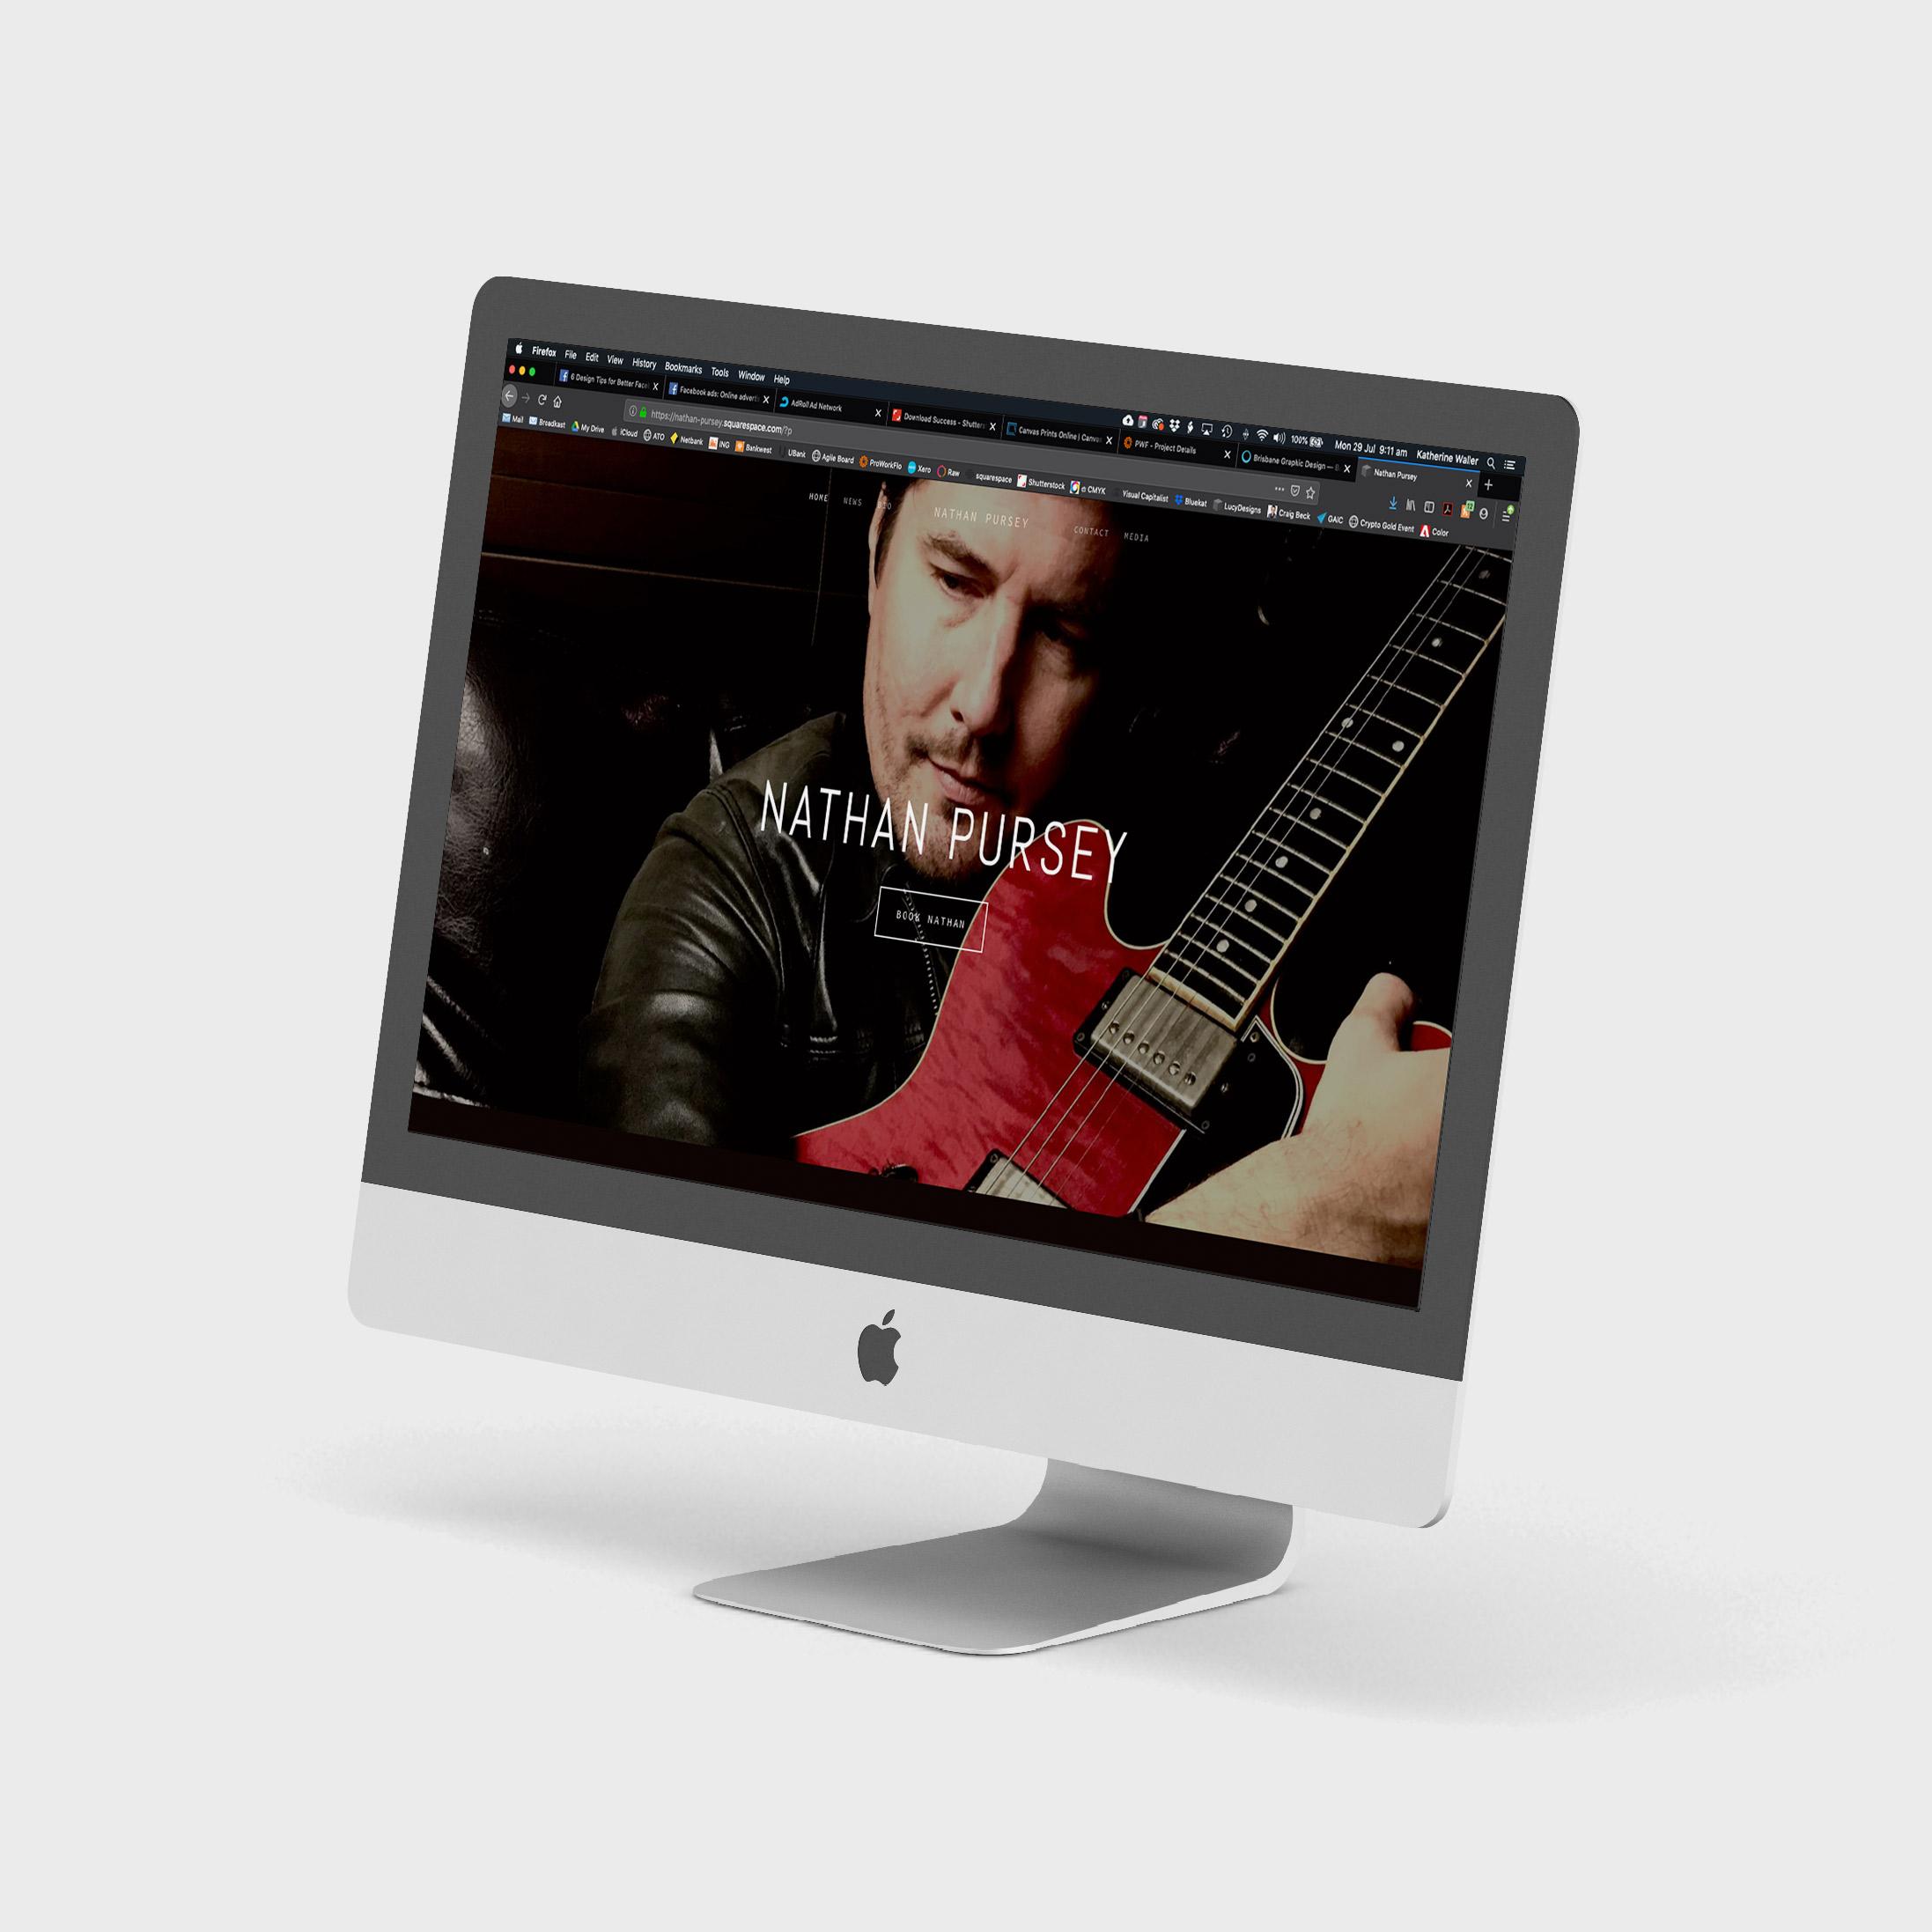 Website of local Brisbane musician Nathan Pursey